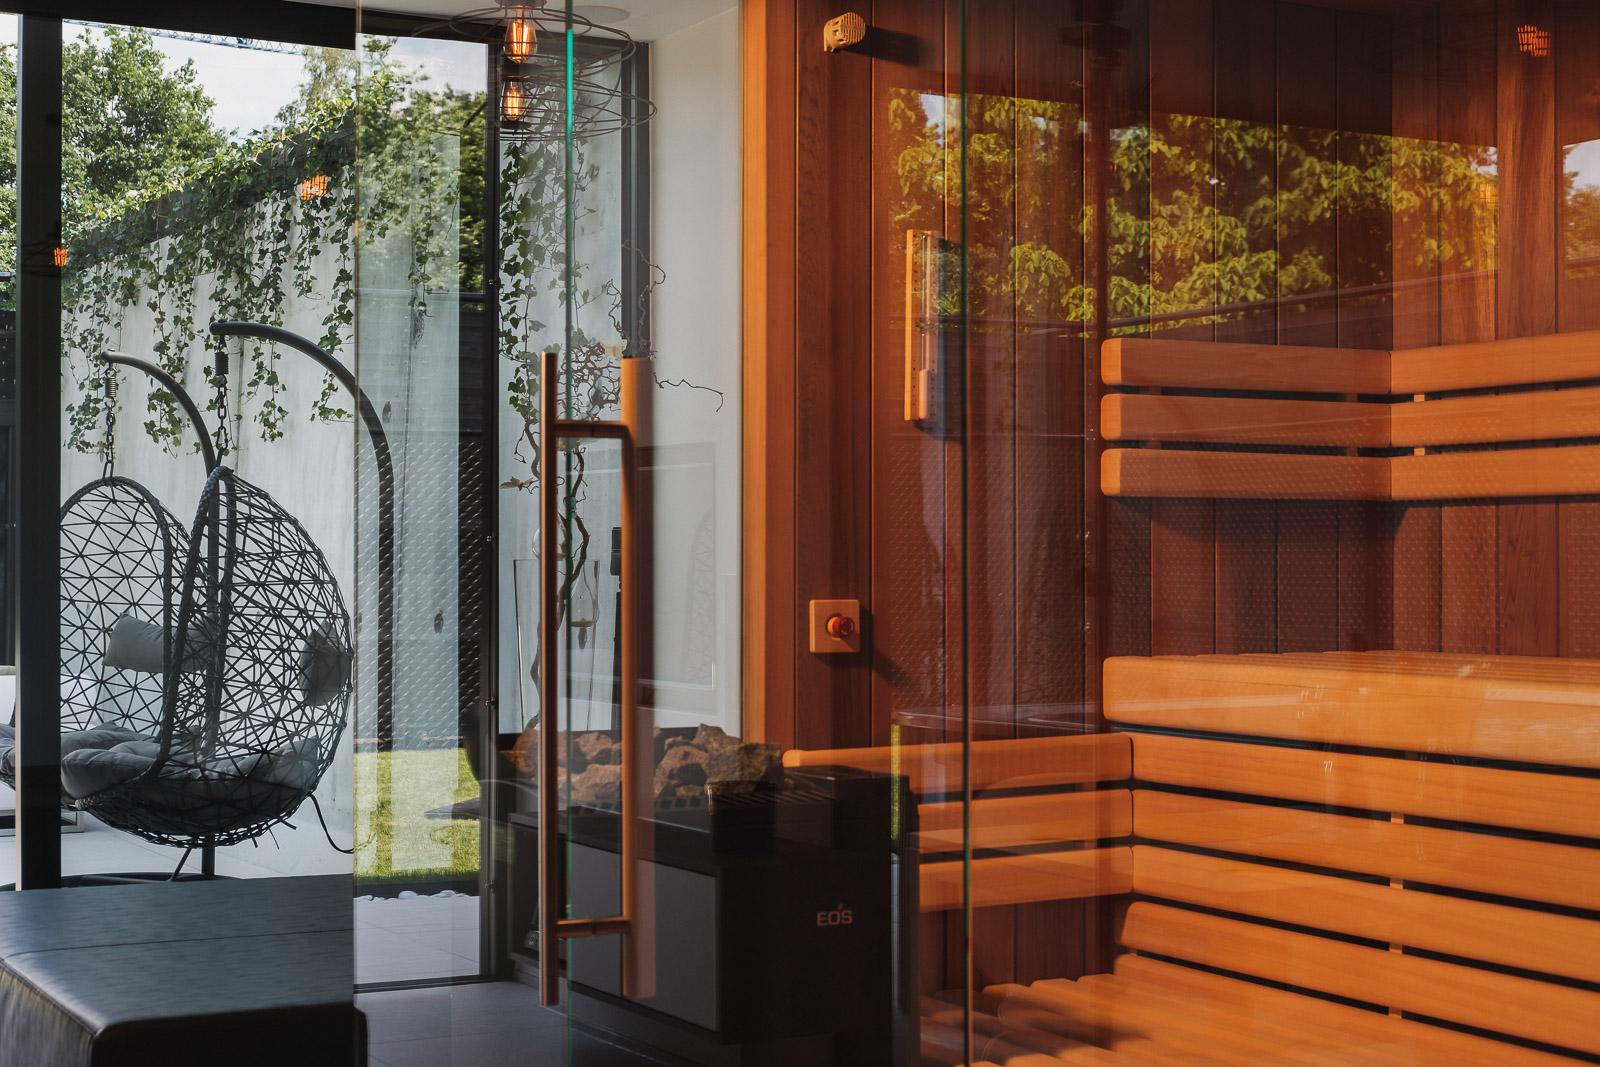 Sauna Wellness Relaxy B Phine iso800 Zonhoven